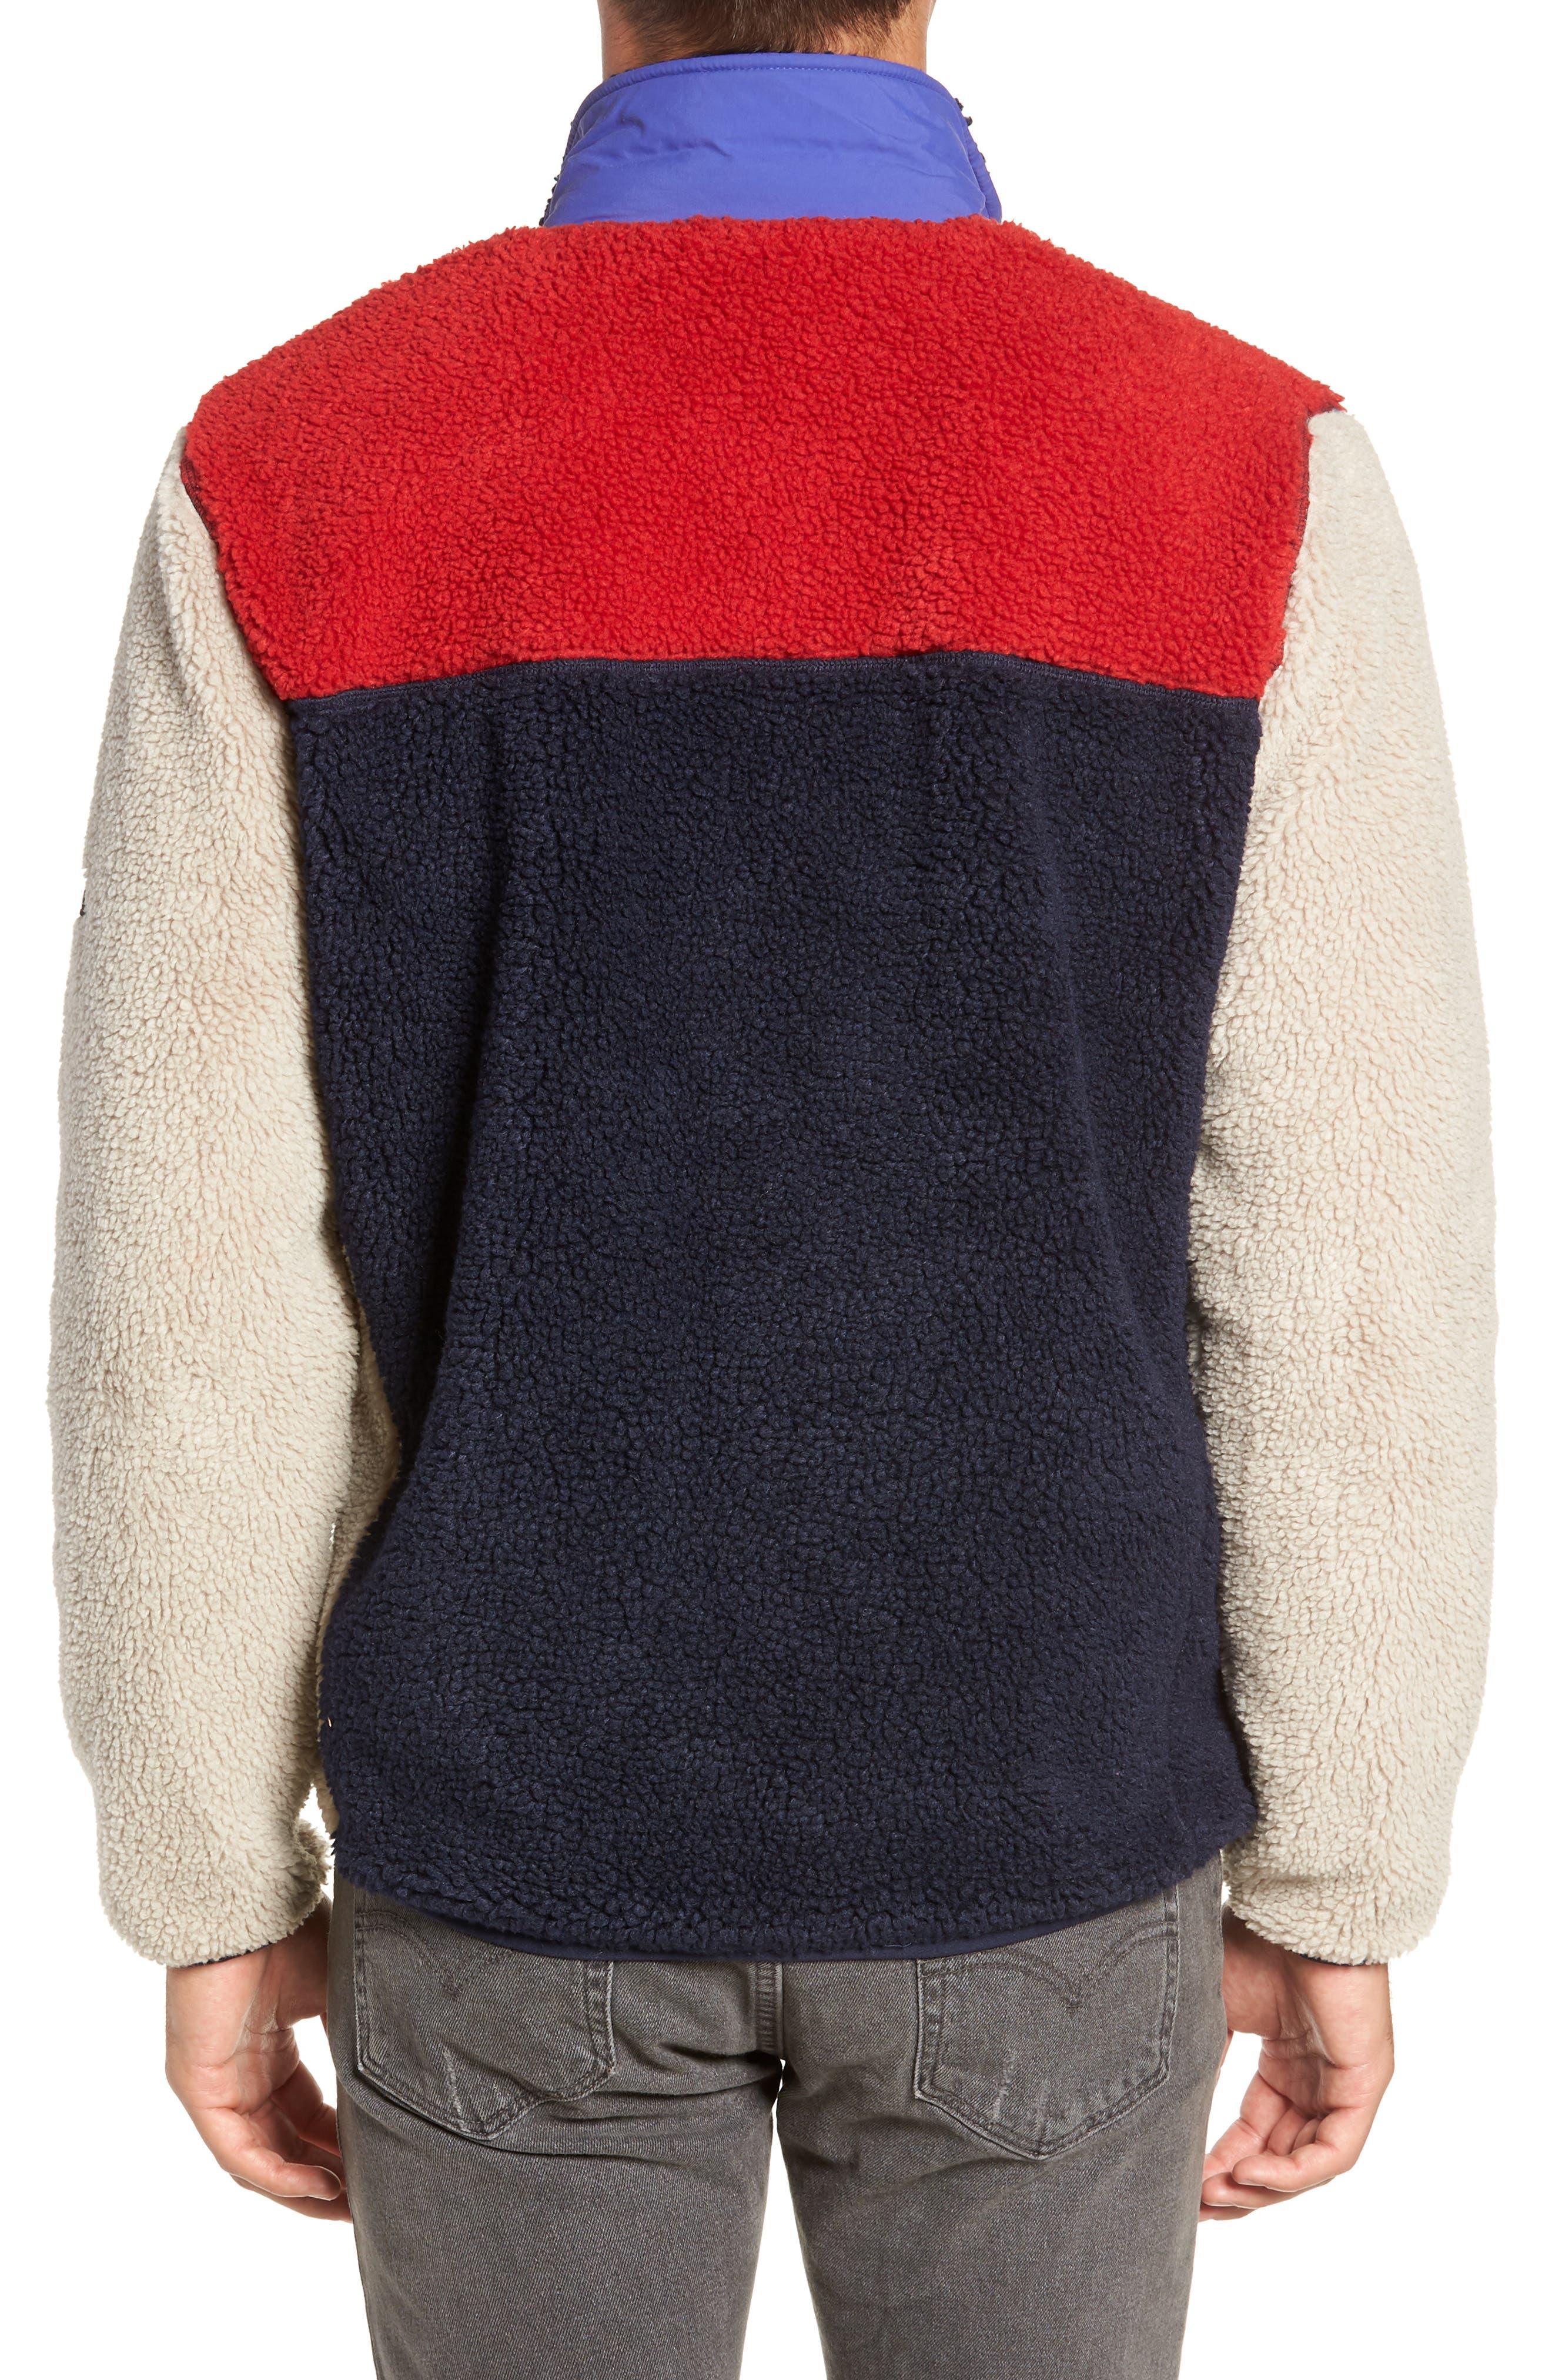 Mattawa Colorblock Fleece Zip Jacket,                             Alternate thumbnail 2, color,                             TAN